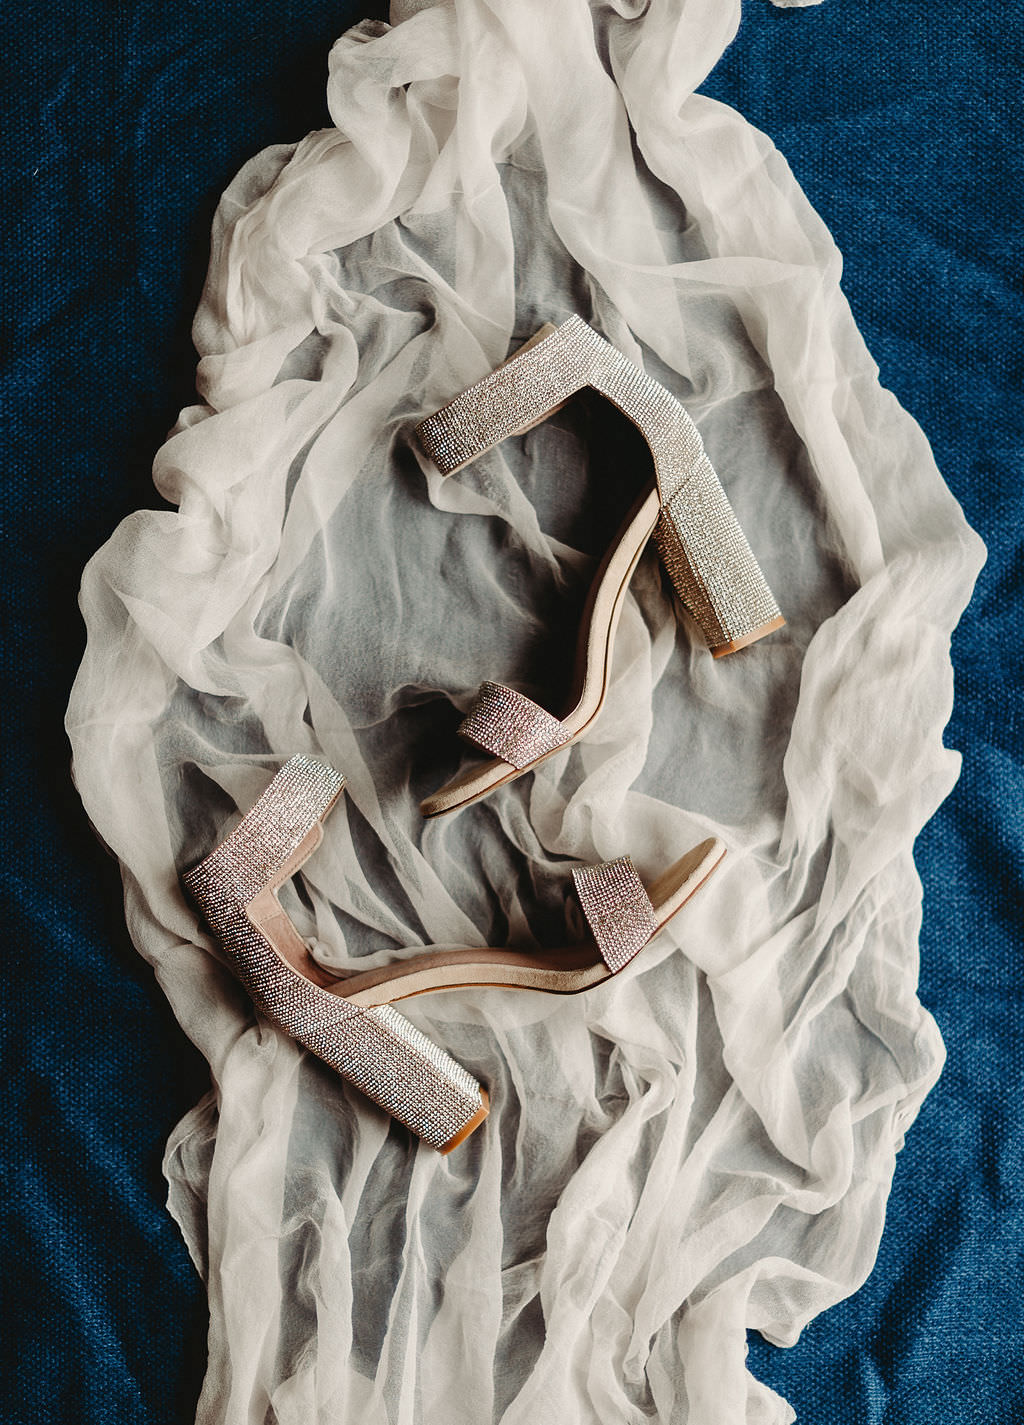 Silver Rhinestone Block Heel Sandal Steve Madden Bridal Wedding Shoes